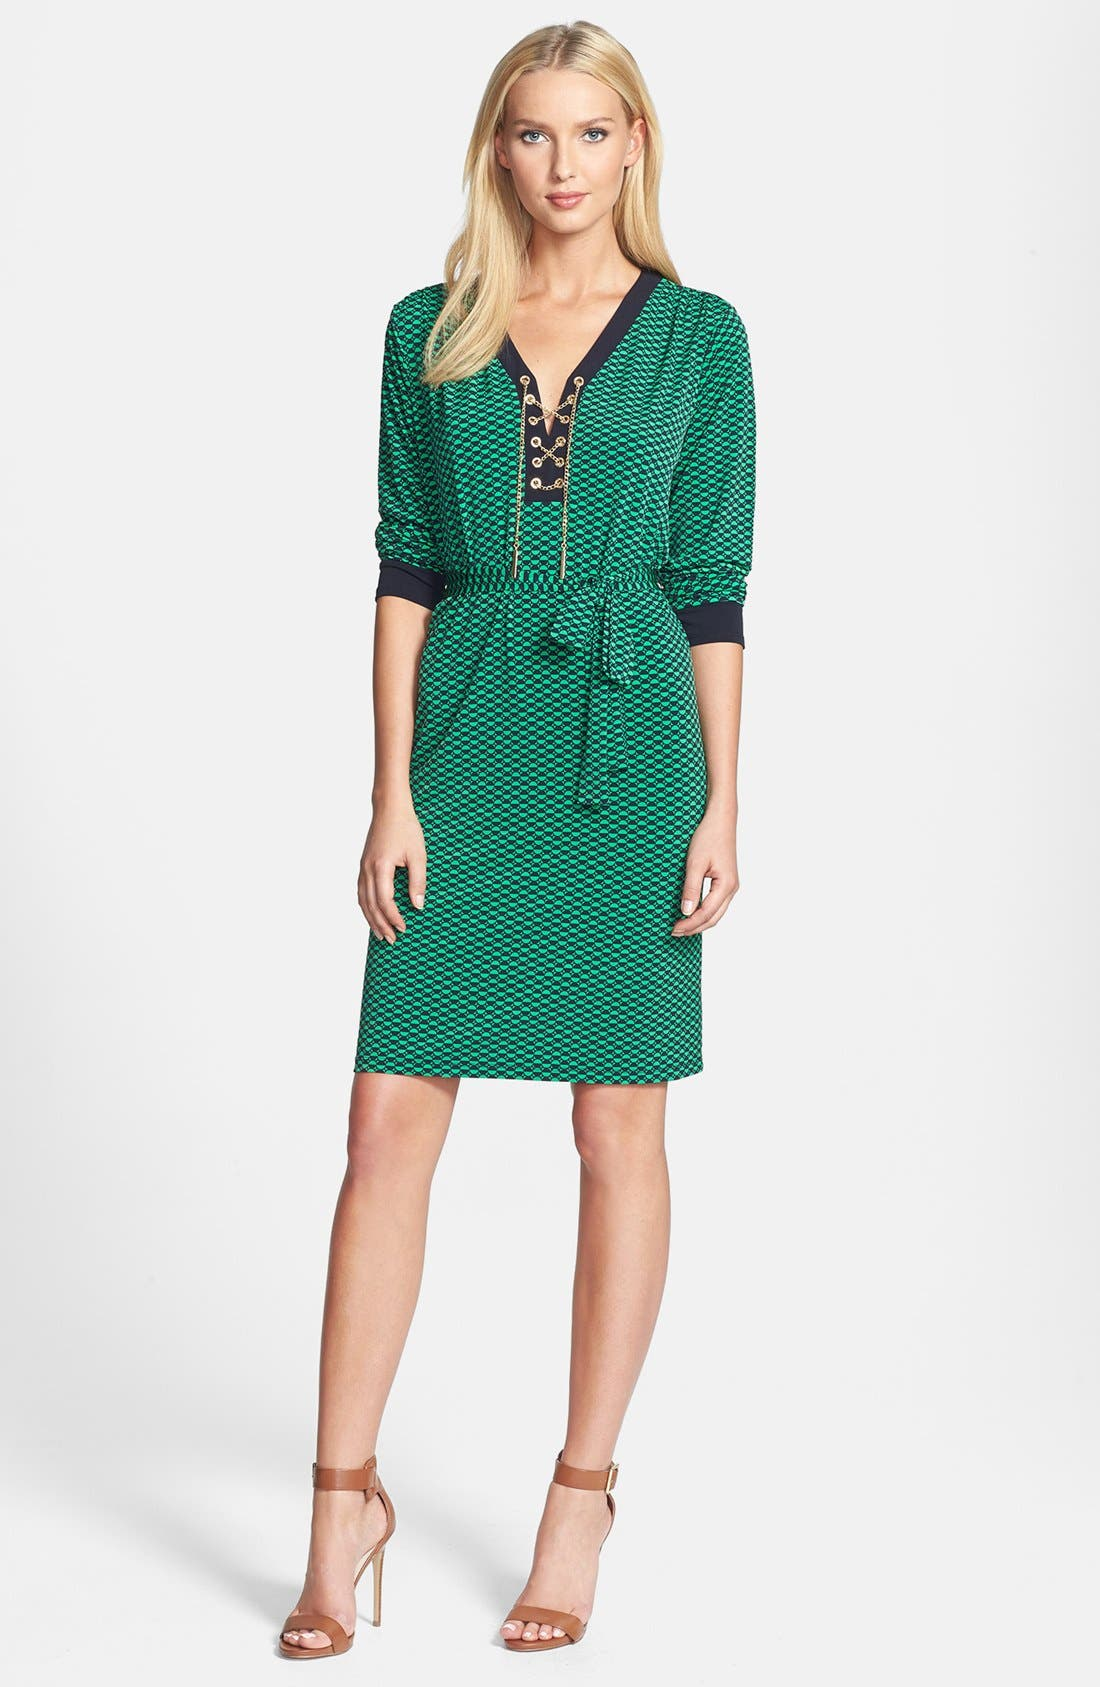 Alternate Image 1 Selected - MICHAEL Michael Kors Lace Up Belted Knit Dress (Regular & Petite)